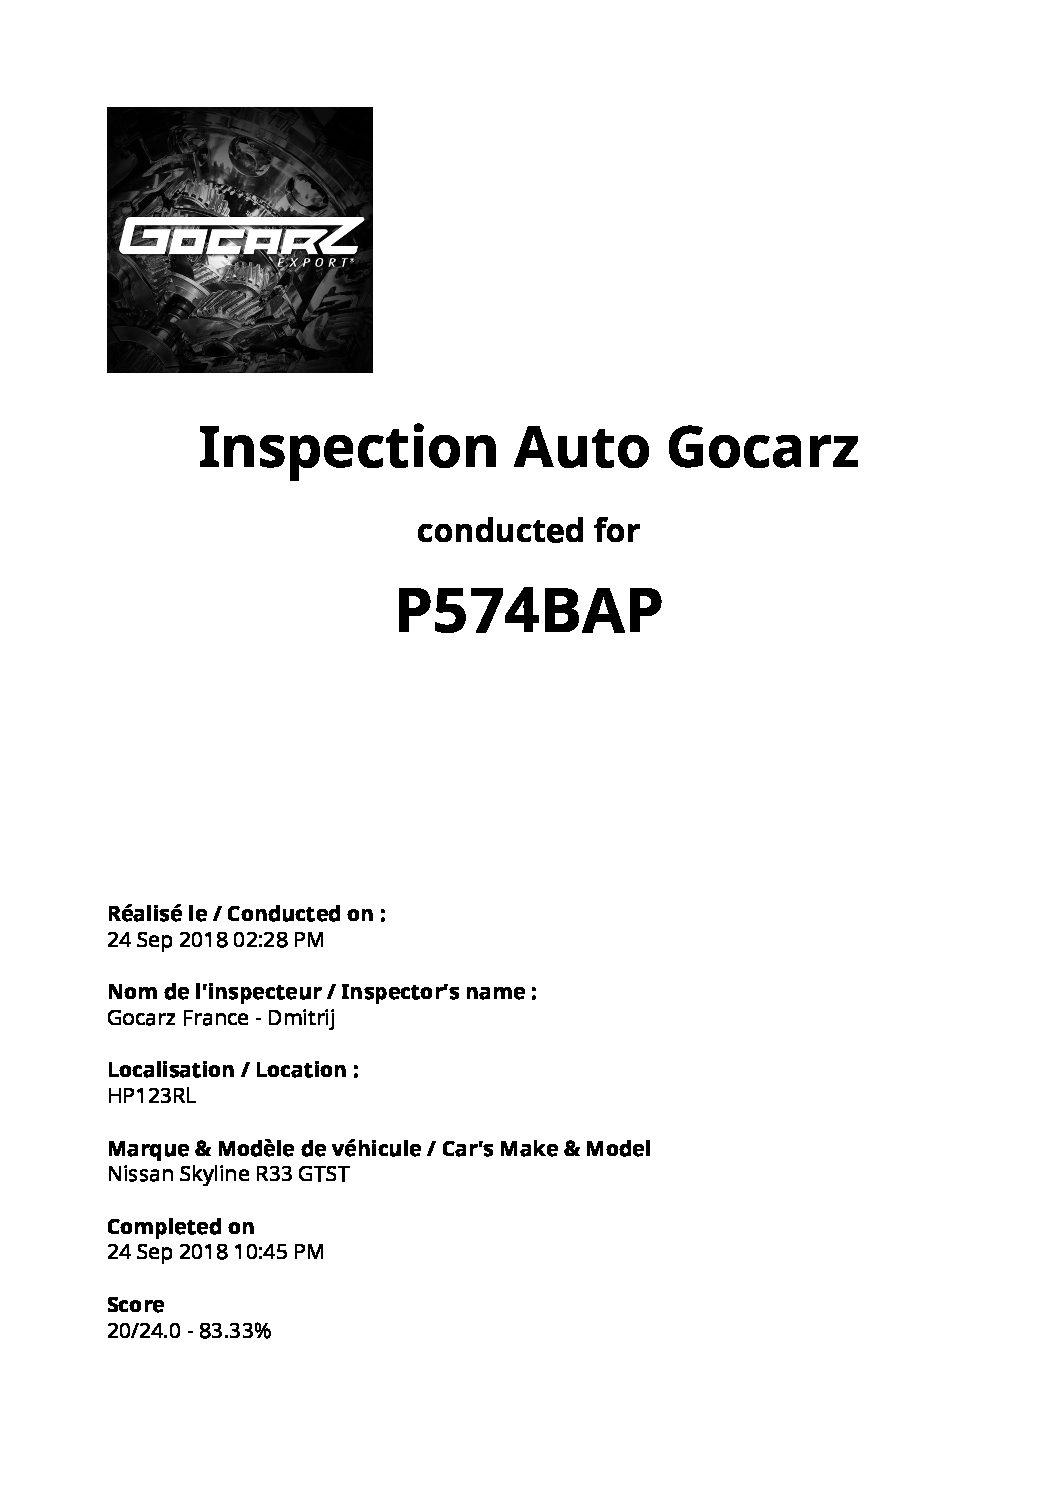 Inspection Gocarz - Nissan Skyline R33 - 2018.09.24